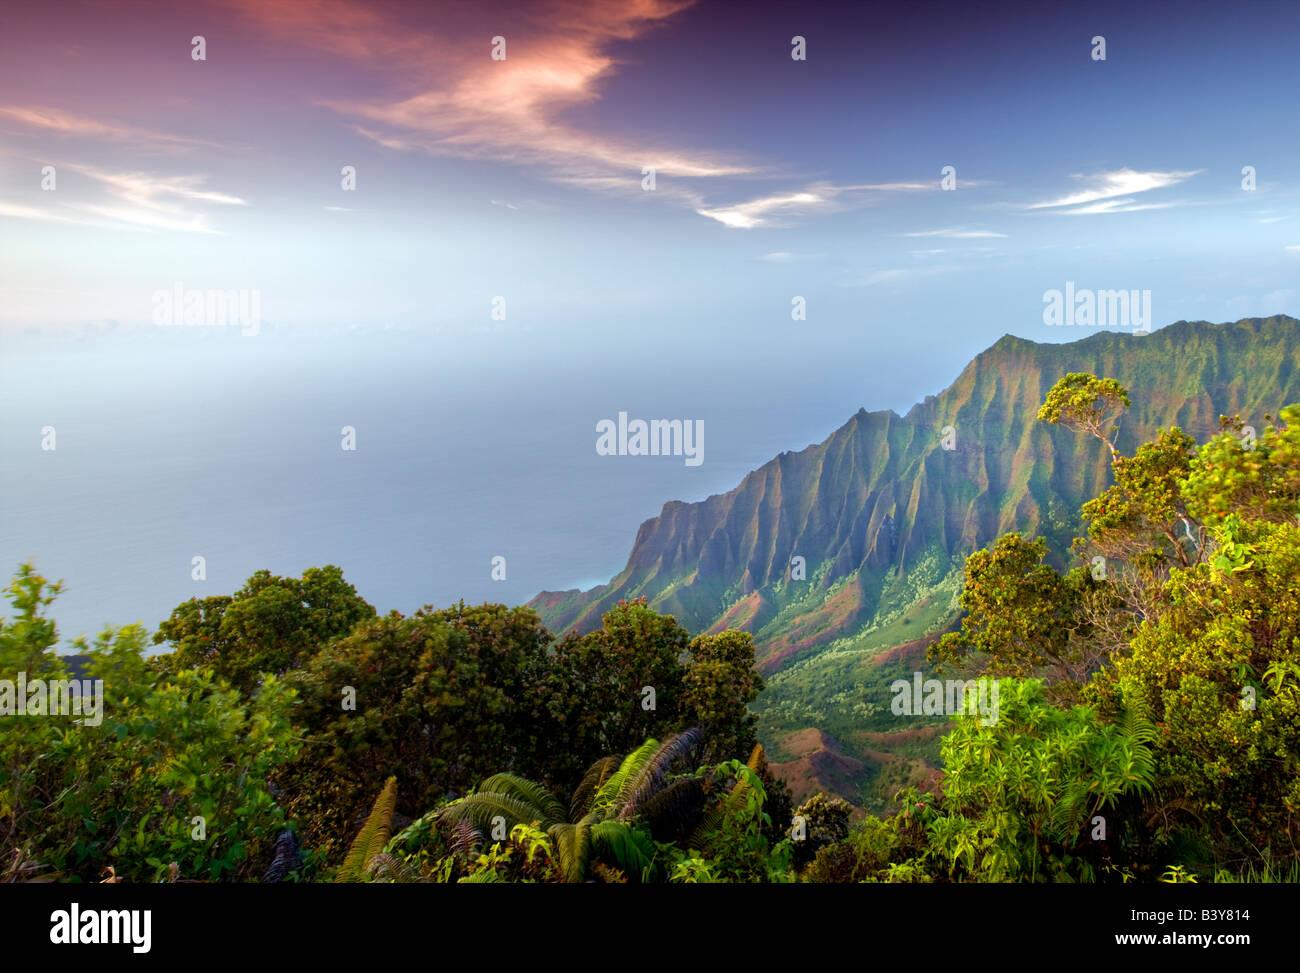 Kalalau Valley at sunset Koke e State Park Waimea Canyon Kauai Hawaii - Stock Image